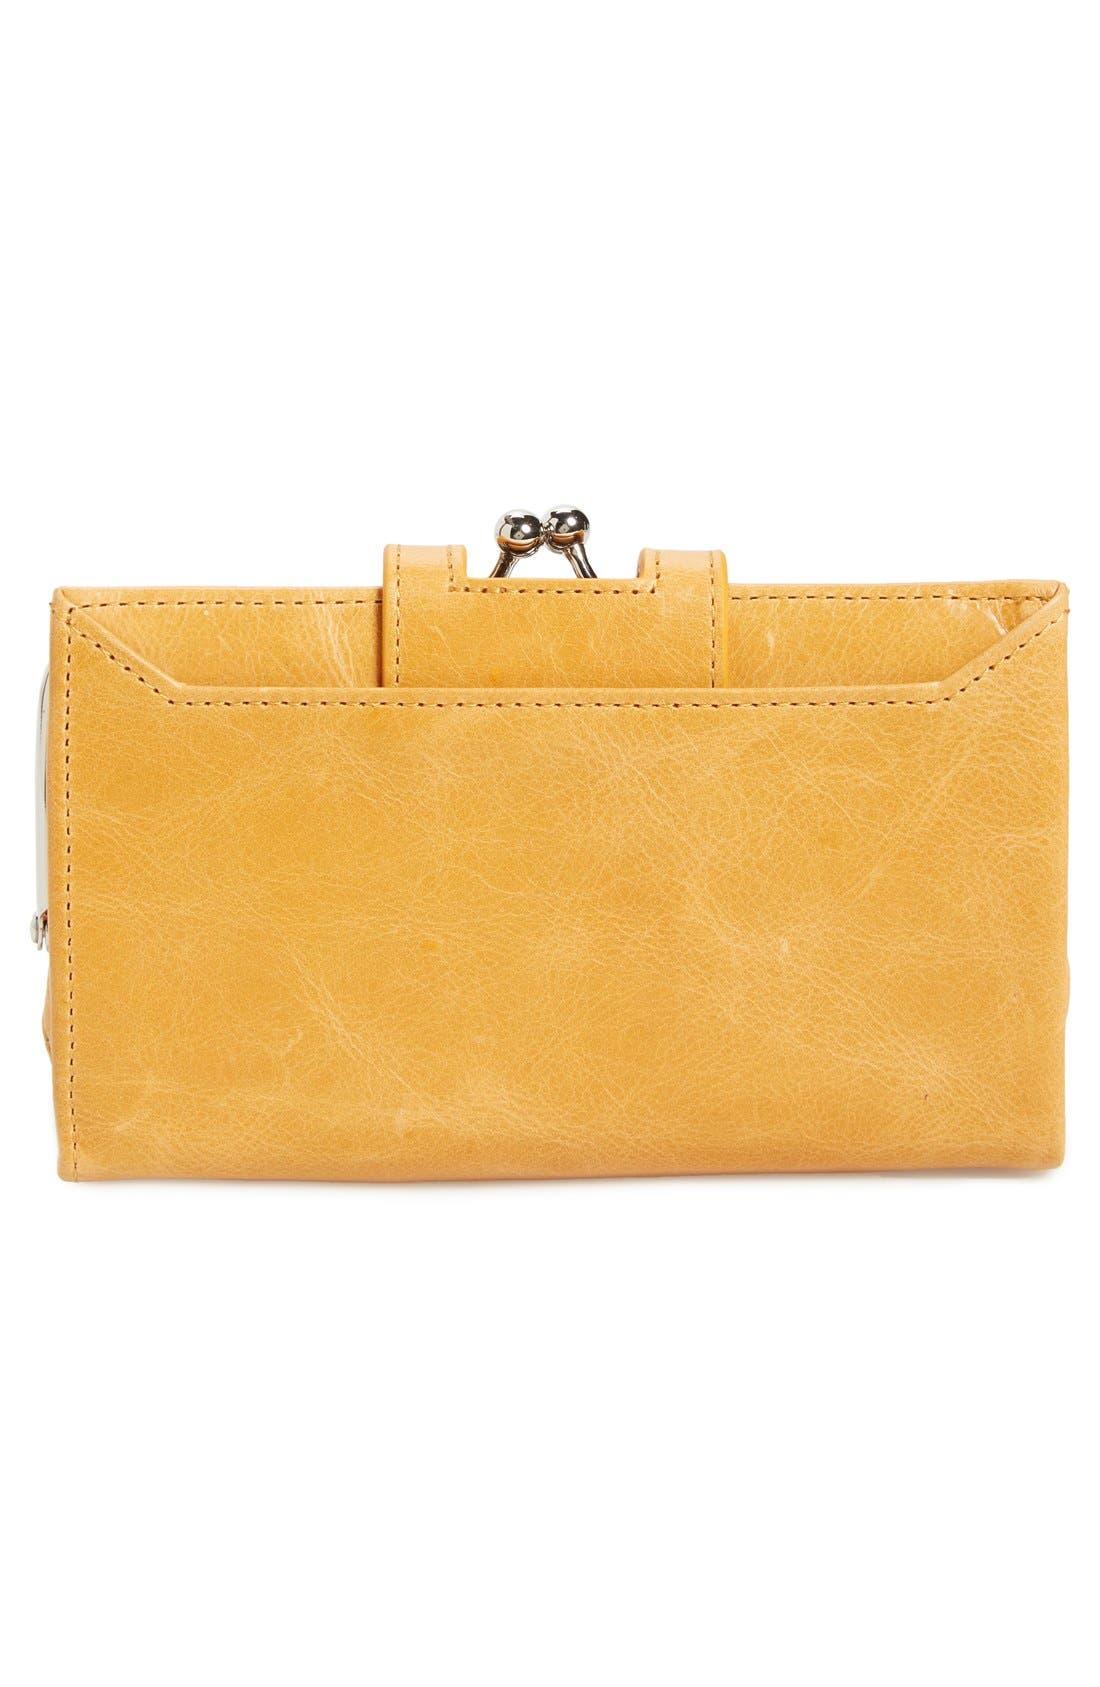 Alternate Image 3  - Hobo 'Alice' Leather Wallet